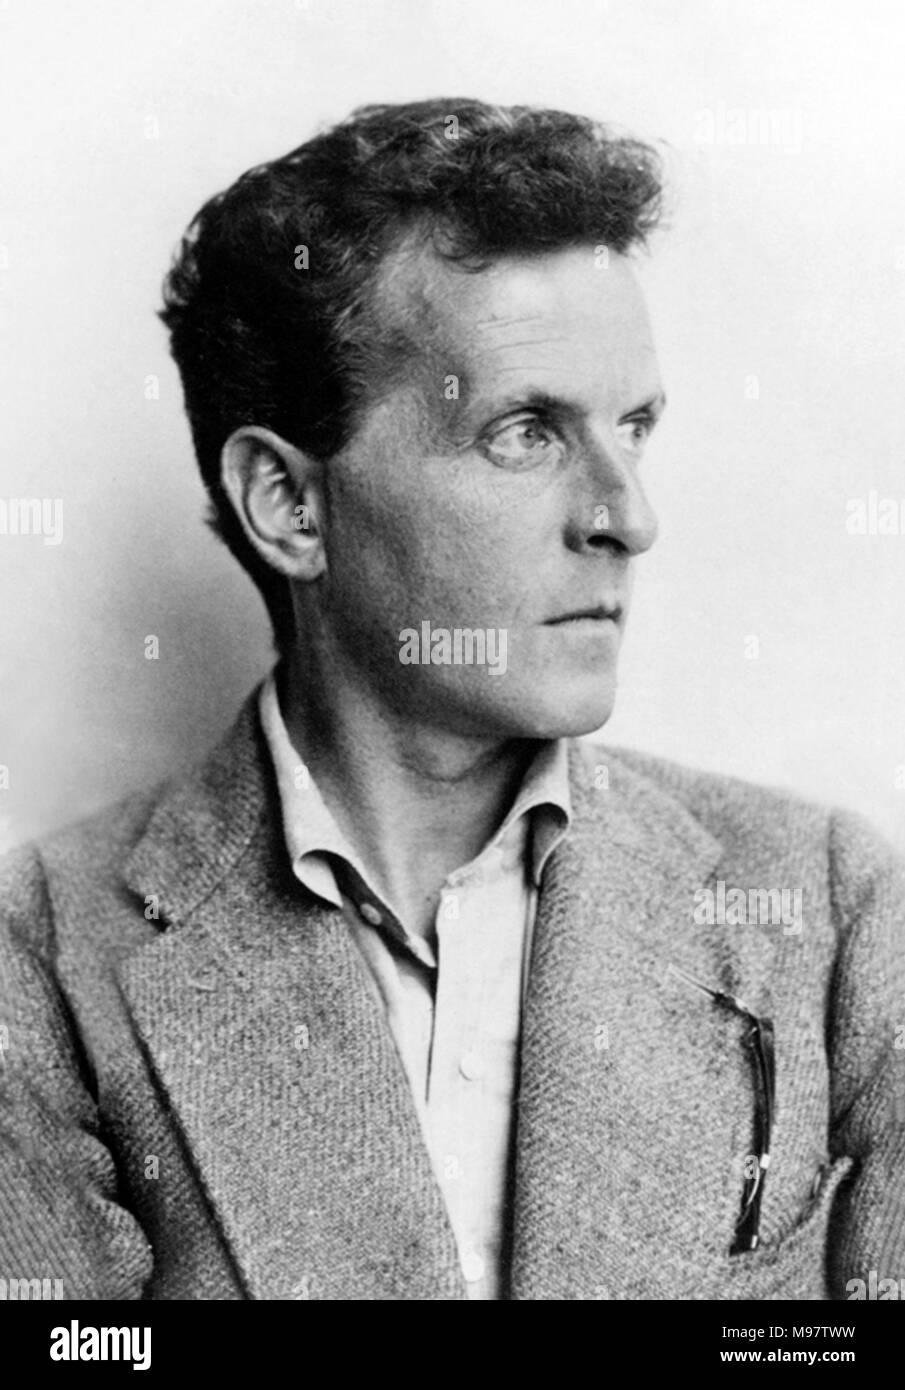 Ludwig Wittgenstein. Portrait of the Austrian philosopher Ludwig Josef Johann Wittgenstein (1889-1951) by Moritz Nähr, 1930. - Stock Image